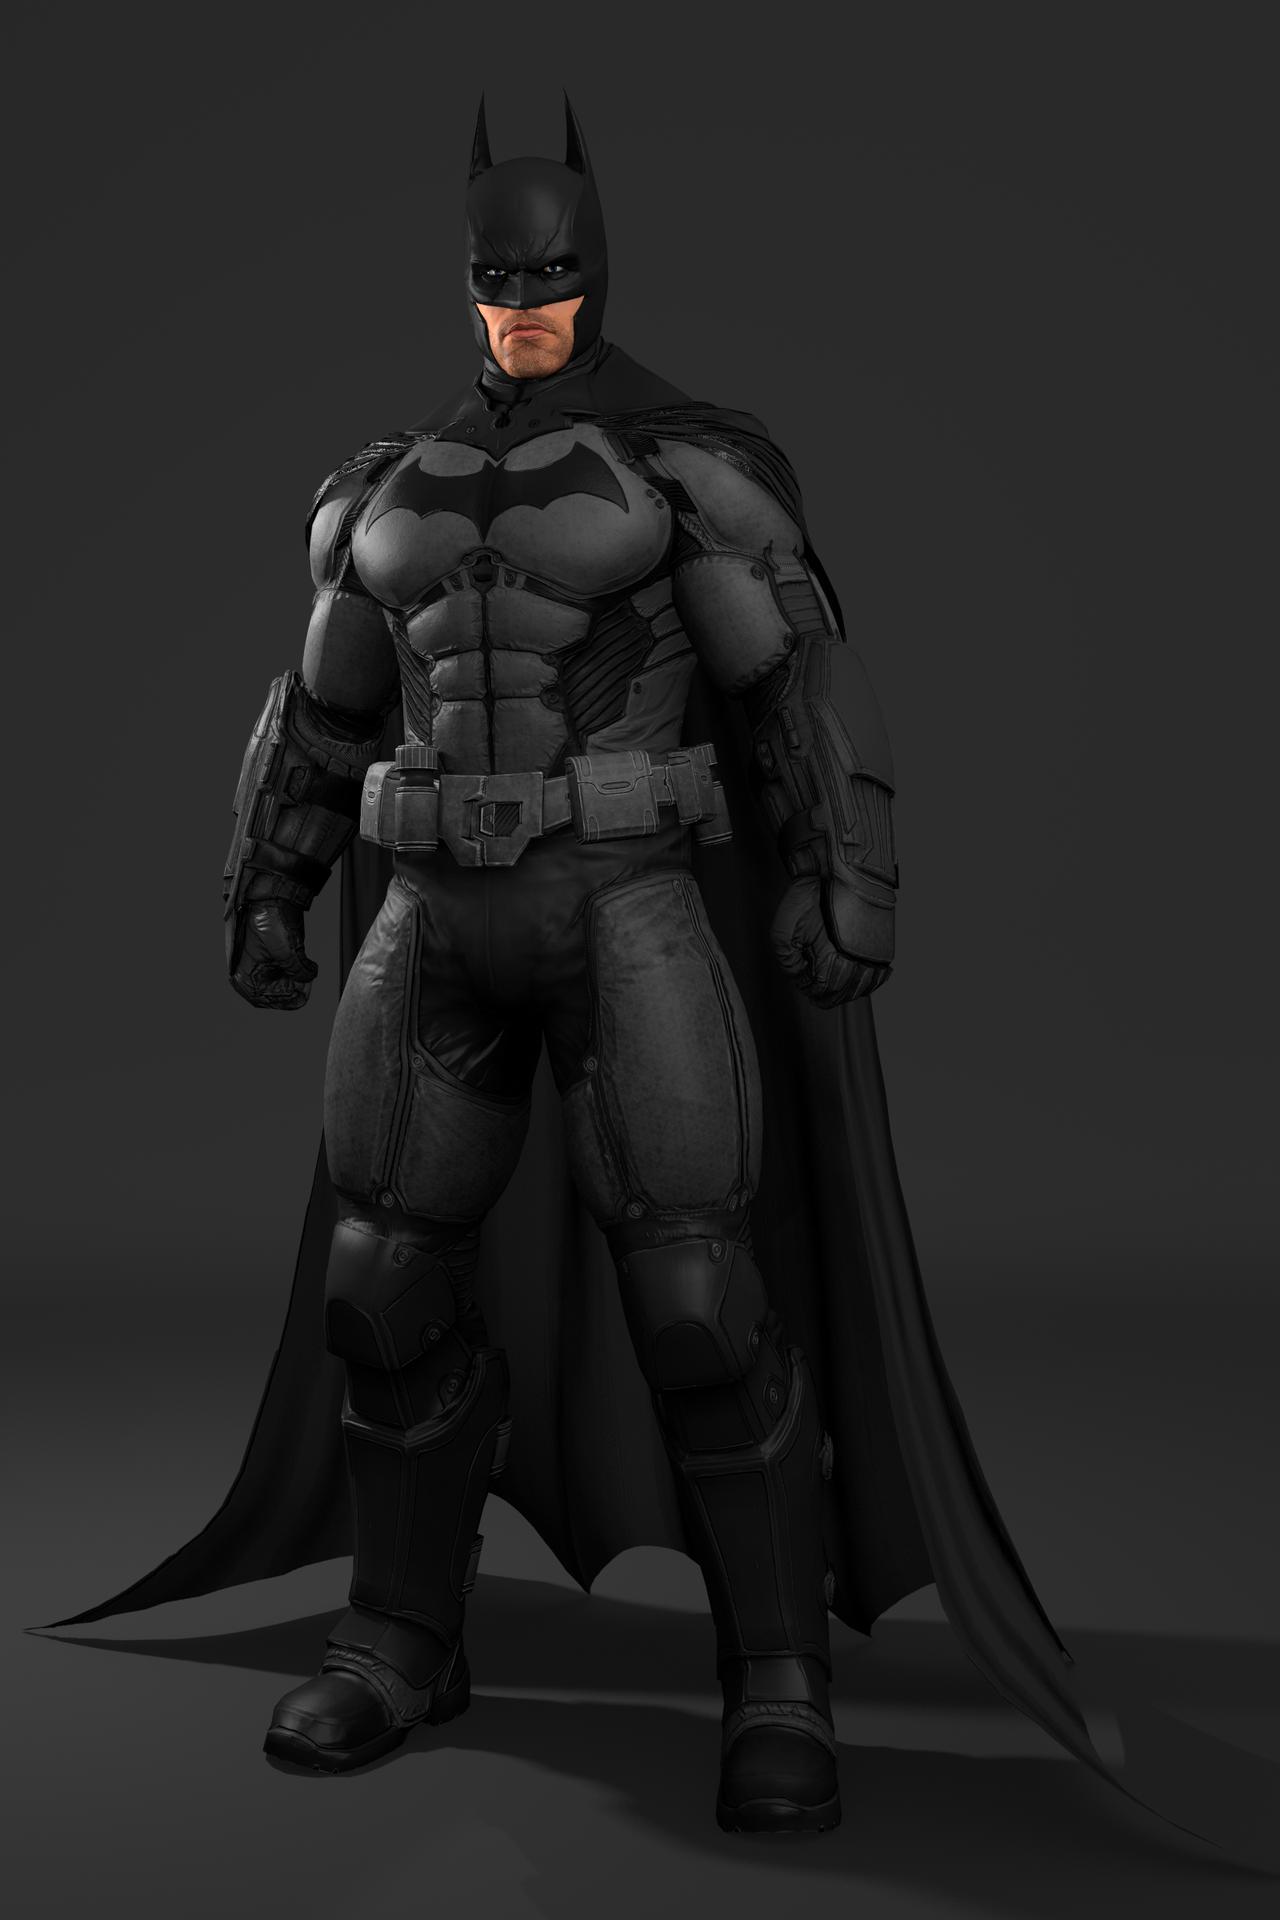 Batman 2019